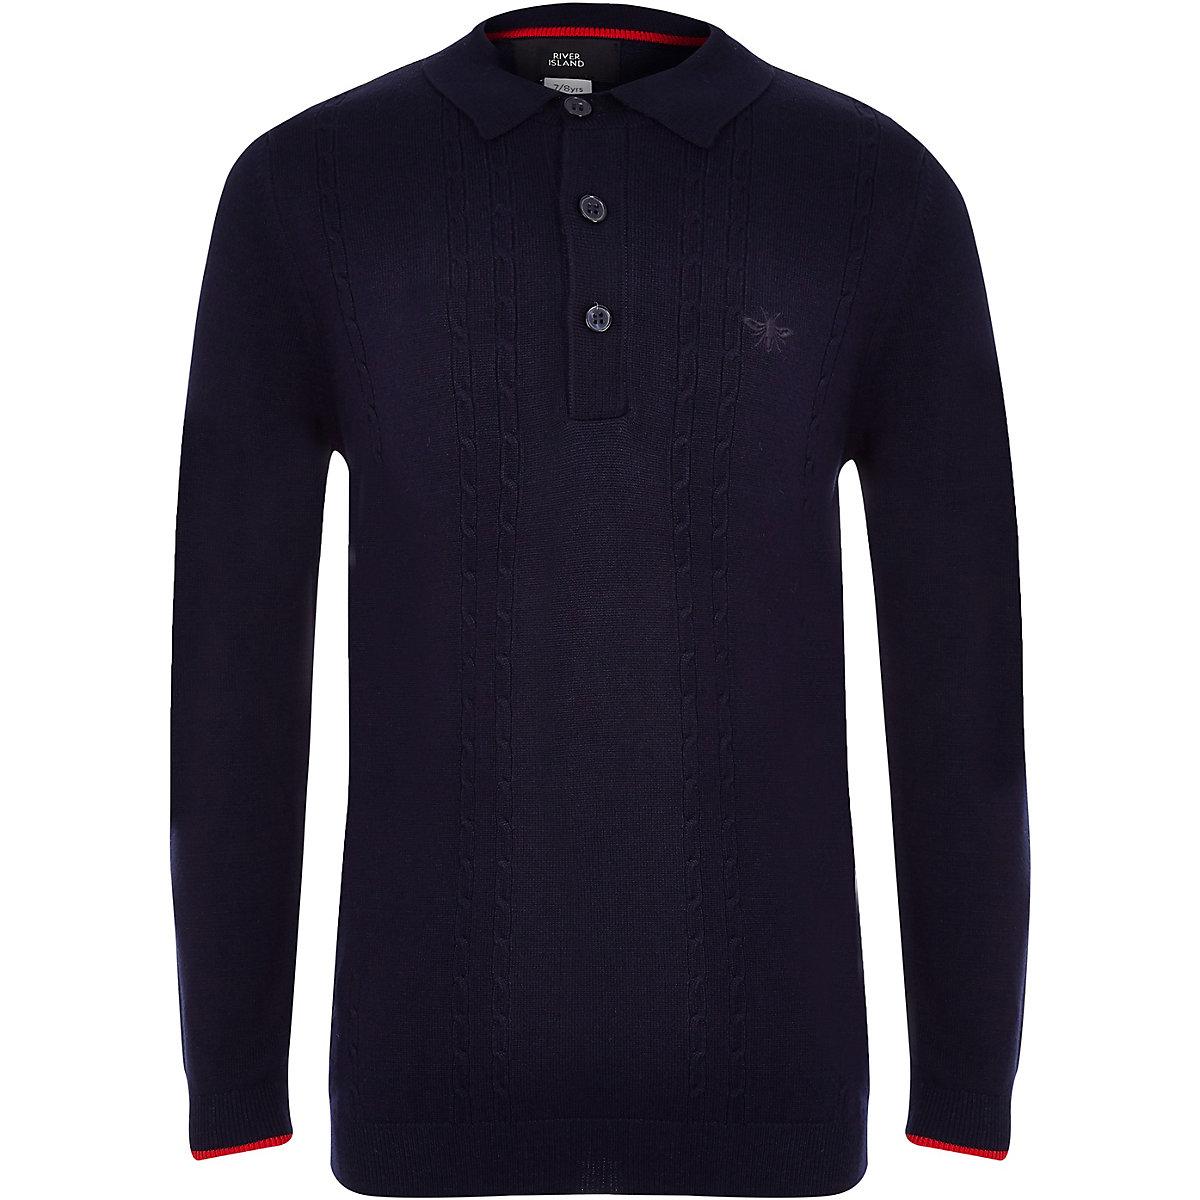 Boys navy cable long sleeve polo shirt